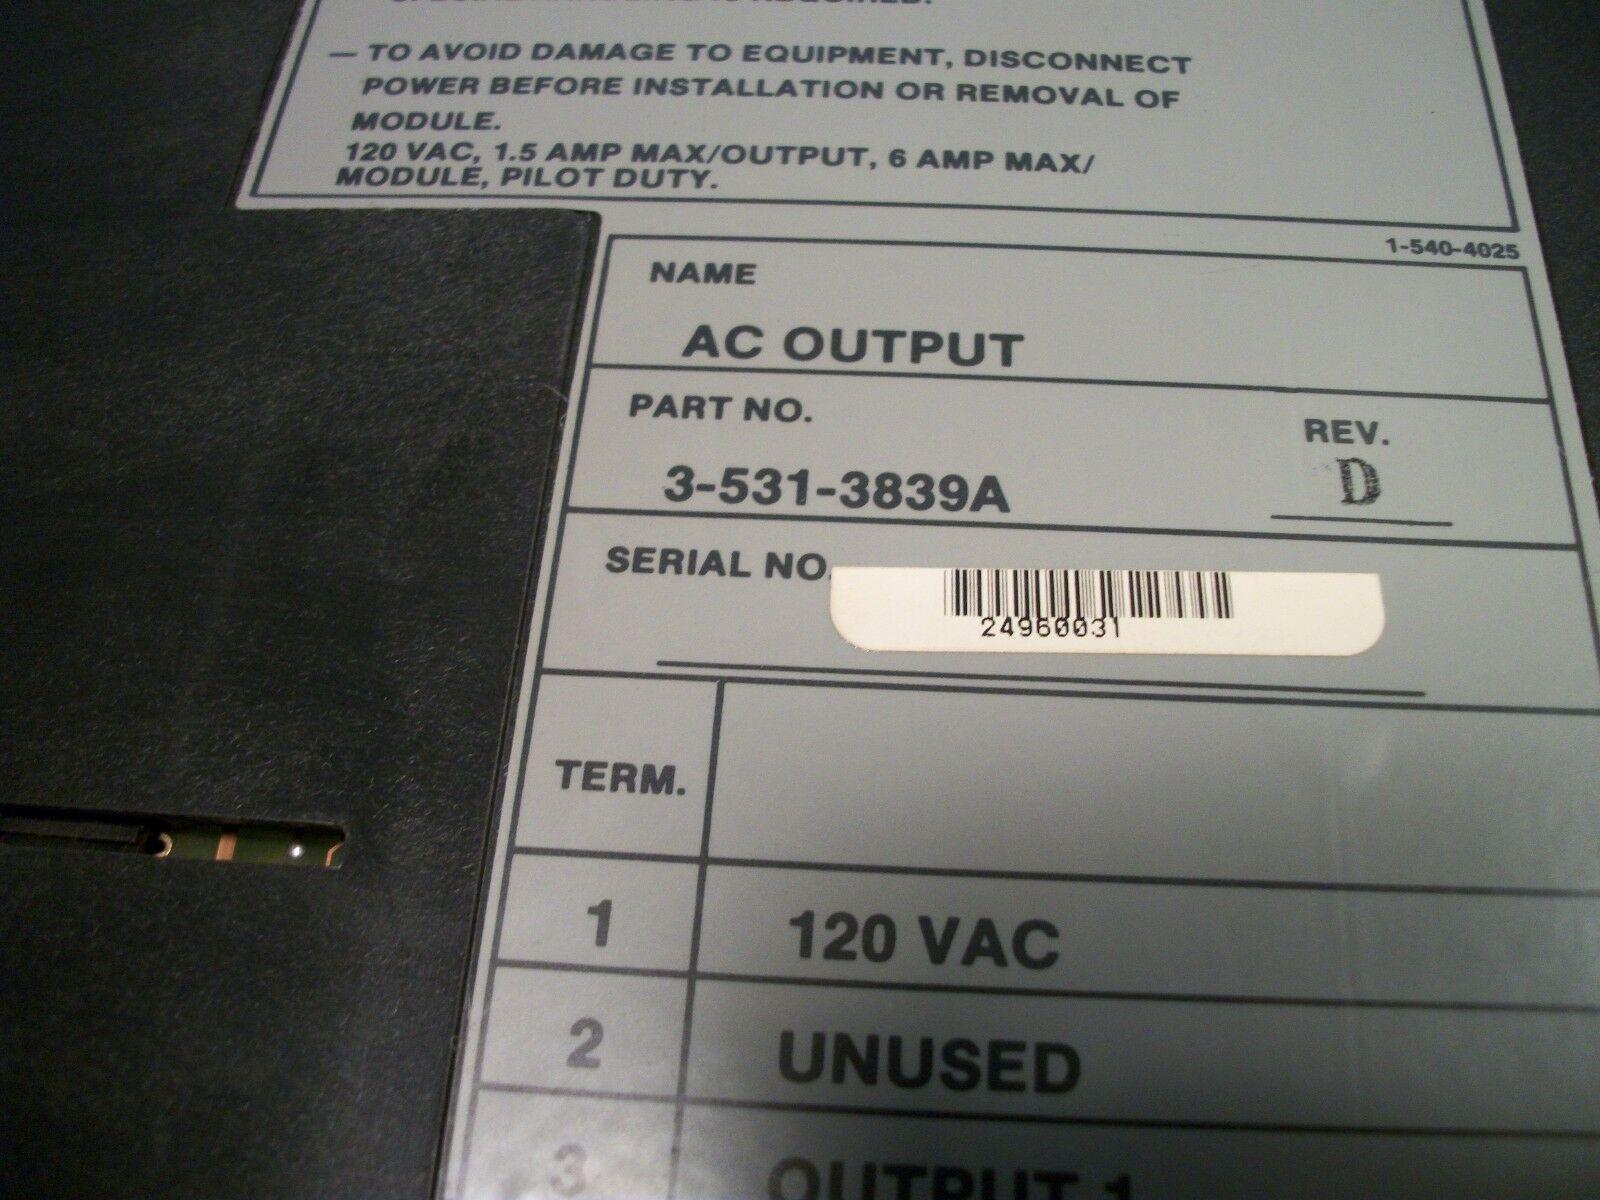 Cincinnati Milacron Siemens CNC Control Circuit I/O Board 3-531-3839A